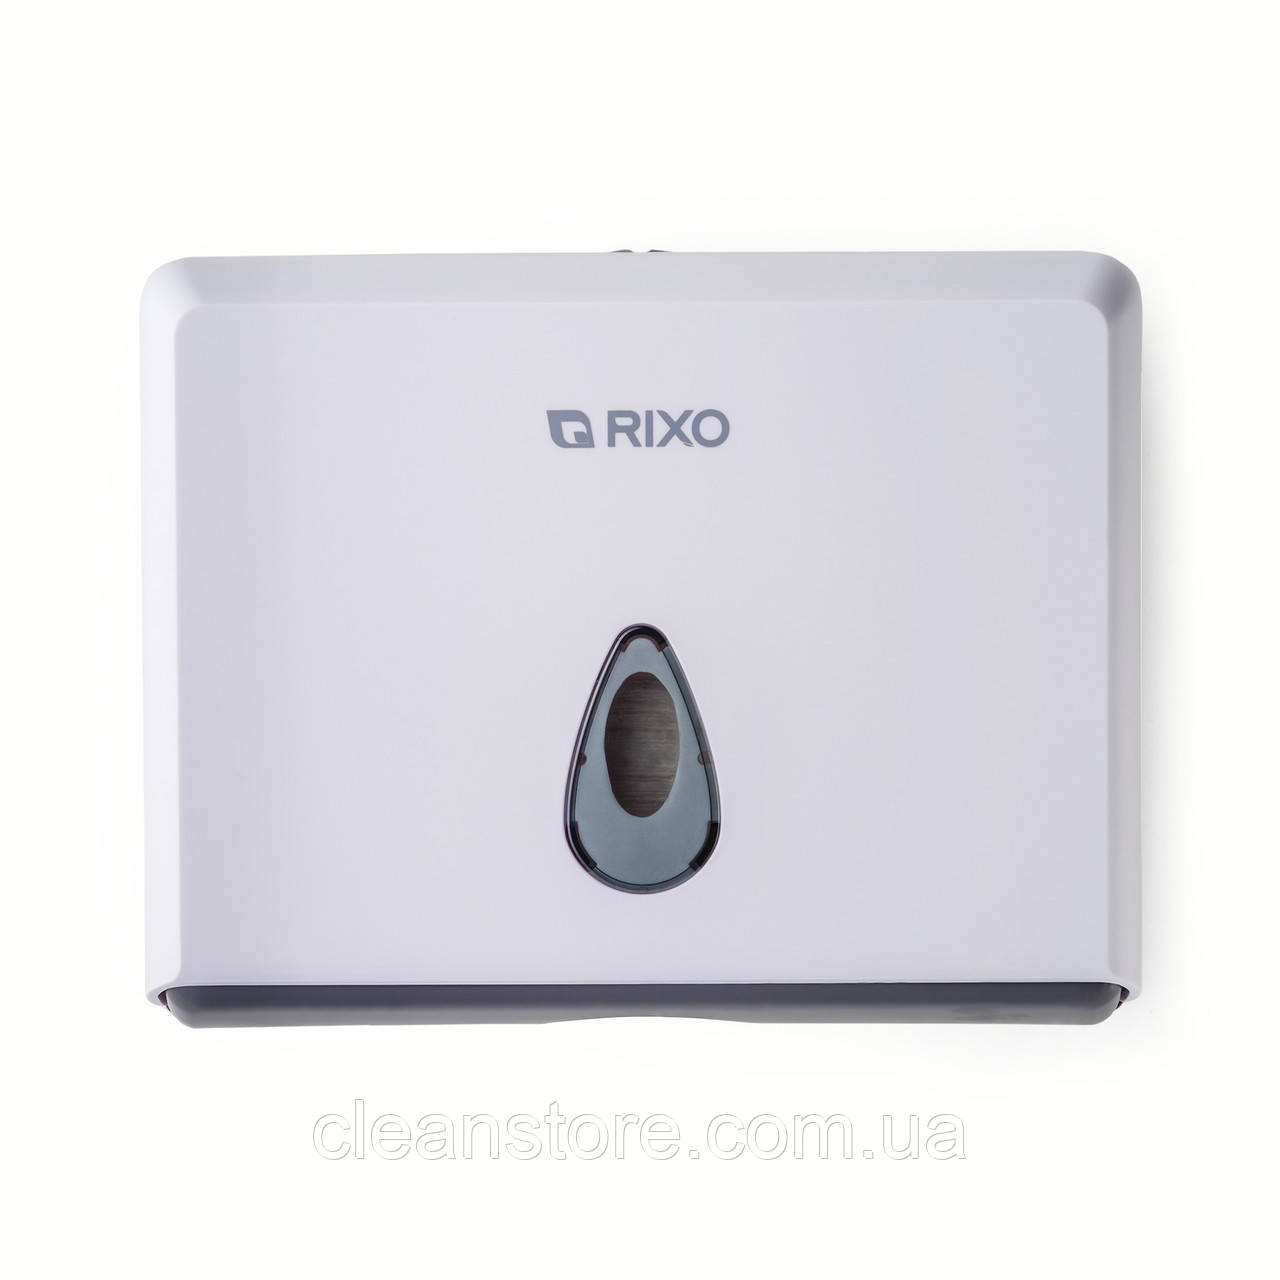 Диспенсер бумажных полотенец Rixo Maggio P055W